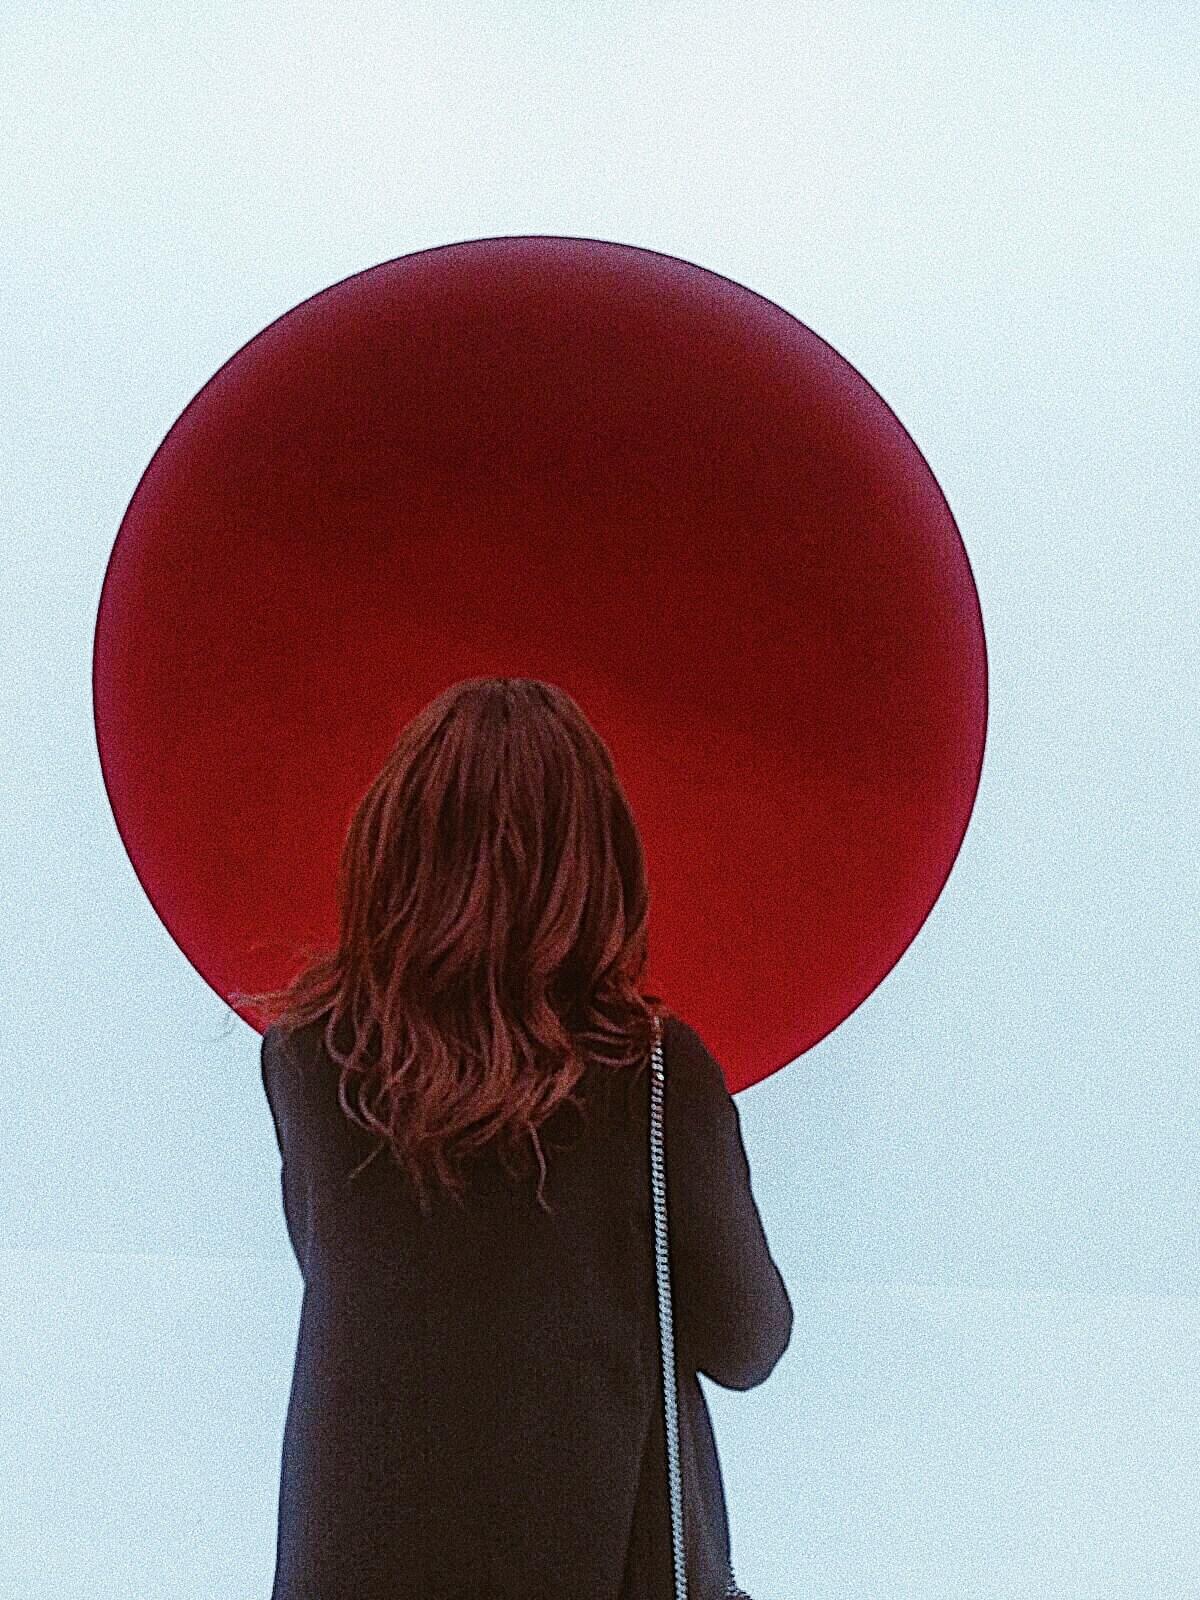 Red Dot Frieze Art Fair - For Raha and Lemons